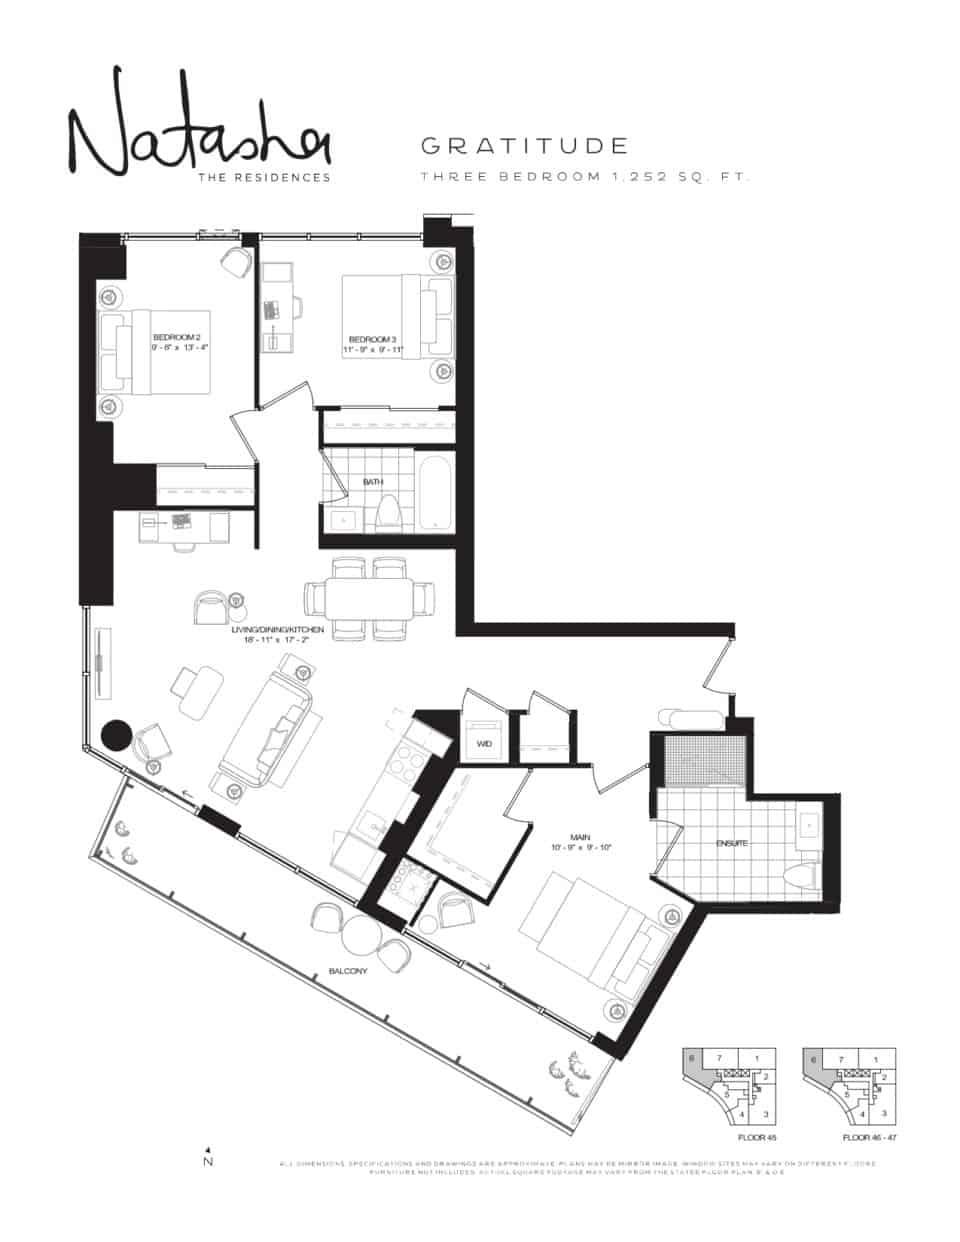 2021 09 02 11 02 14 natashatheresidences lanterradevelopments floorplans gratitude